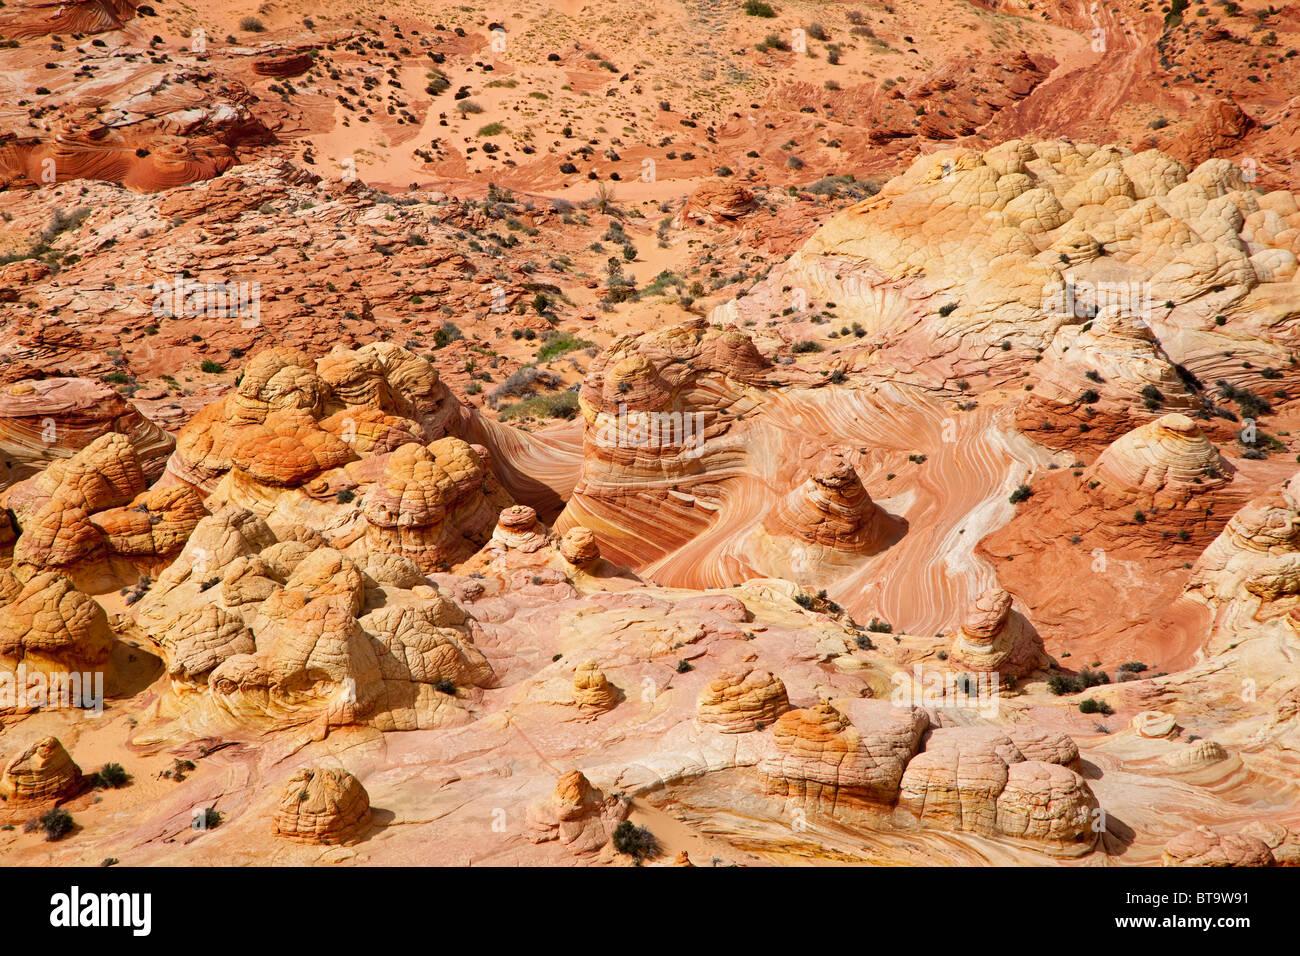 Brain Rocks, bizarre rock formations in Coyote Buttes North, Paria Canyon-Vermilion Cliffs Wilderness, Utah, Arizona, - Stock Image